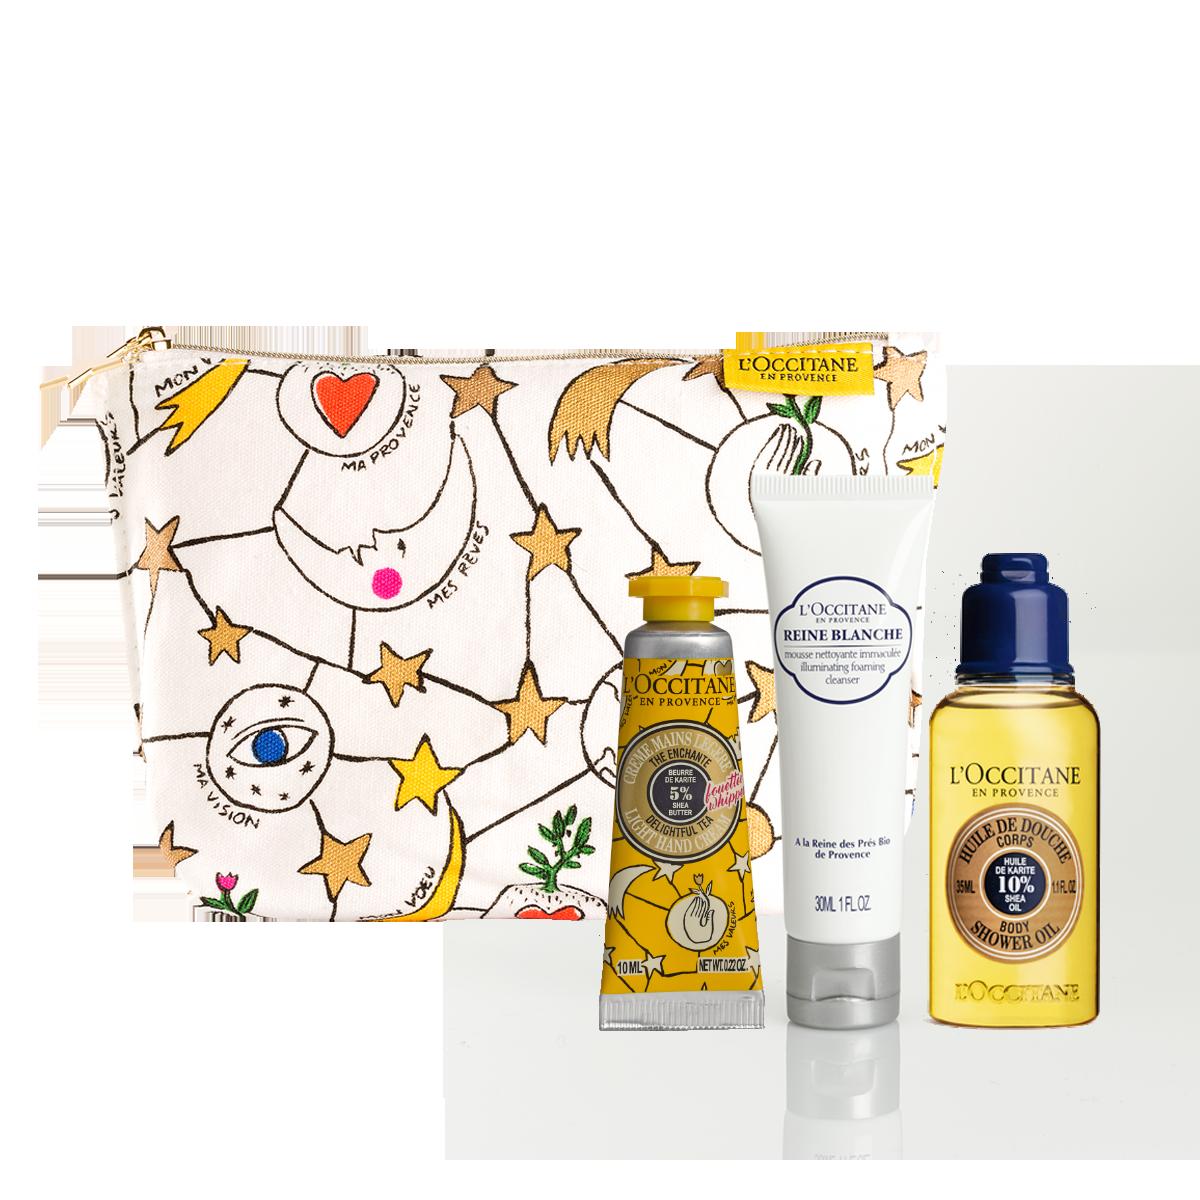 Gratis! Illuminate Trio Holiday Gift Set